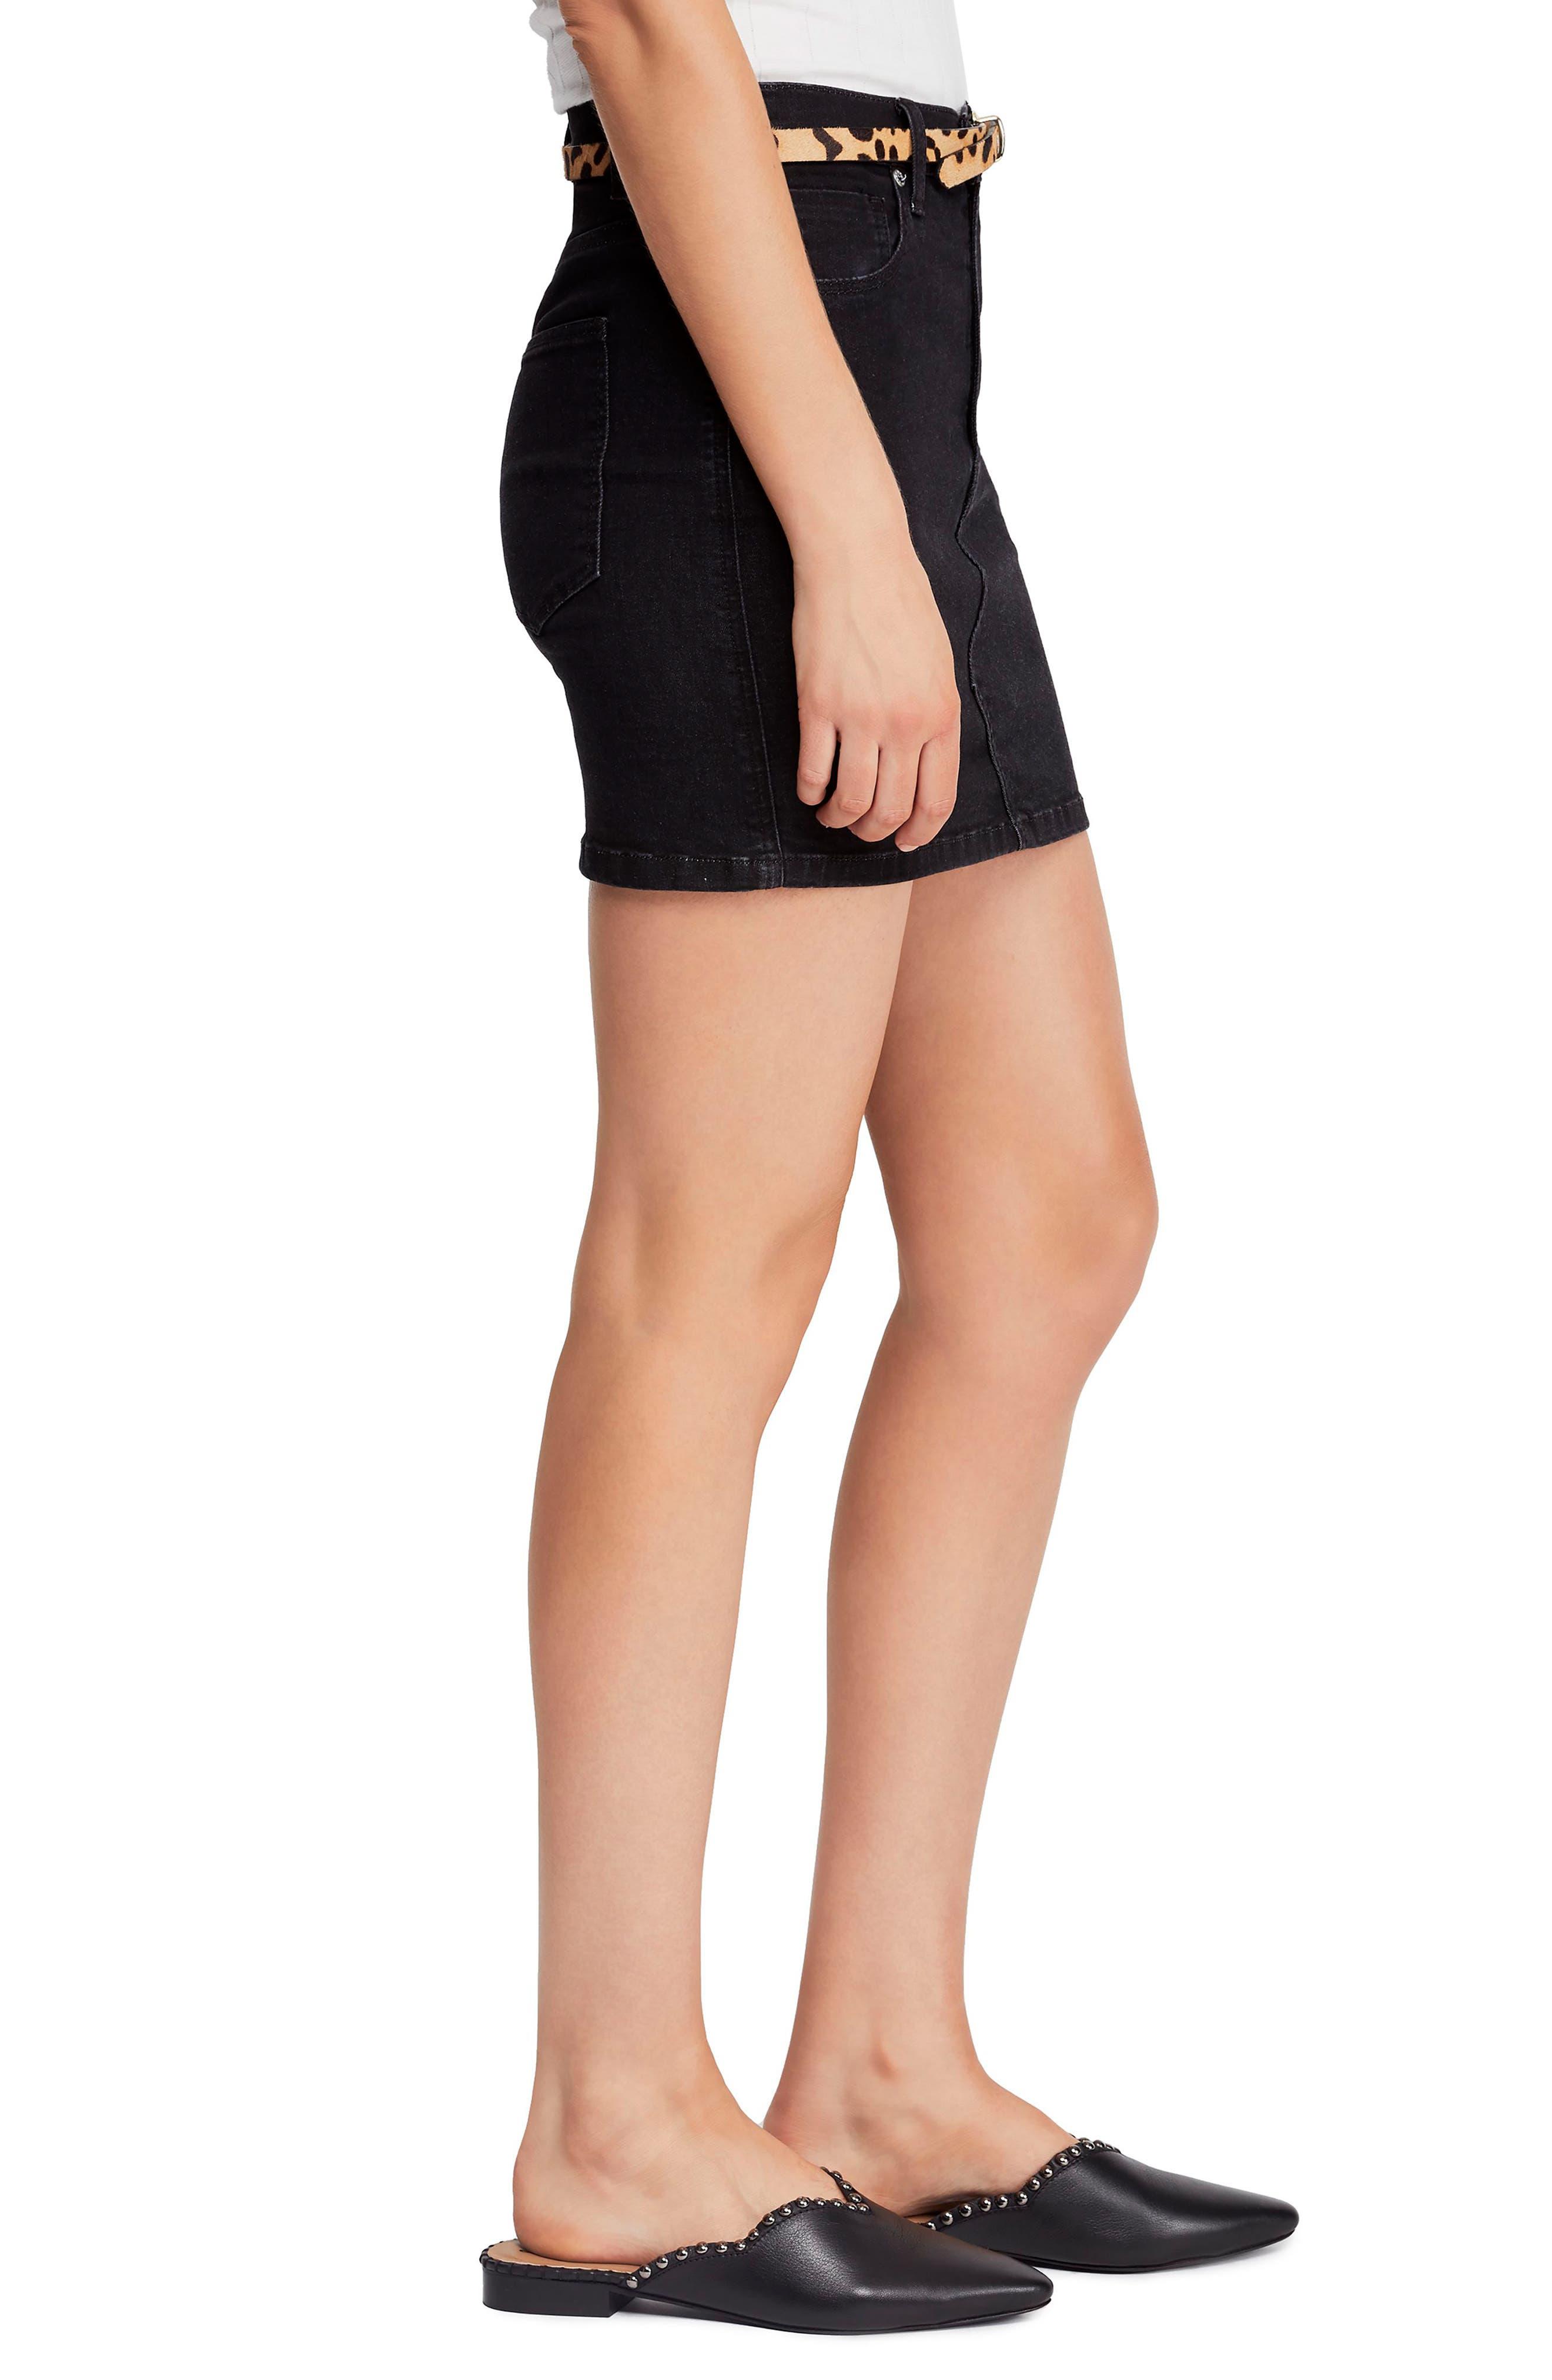 FREE PEOPLE, Teagan Denim Miniskirt, Alternate thumbnail 4, color, BLACK